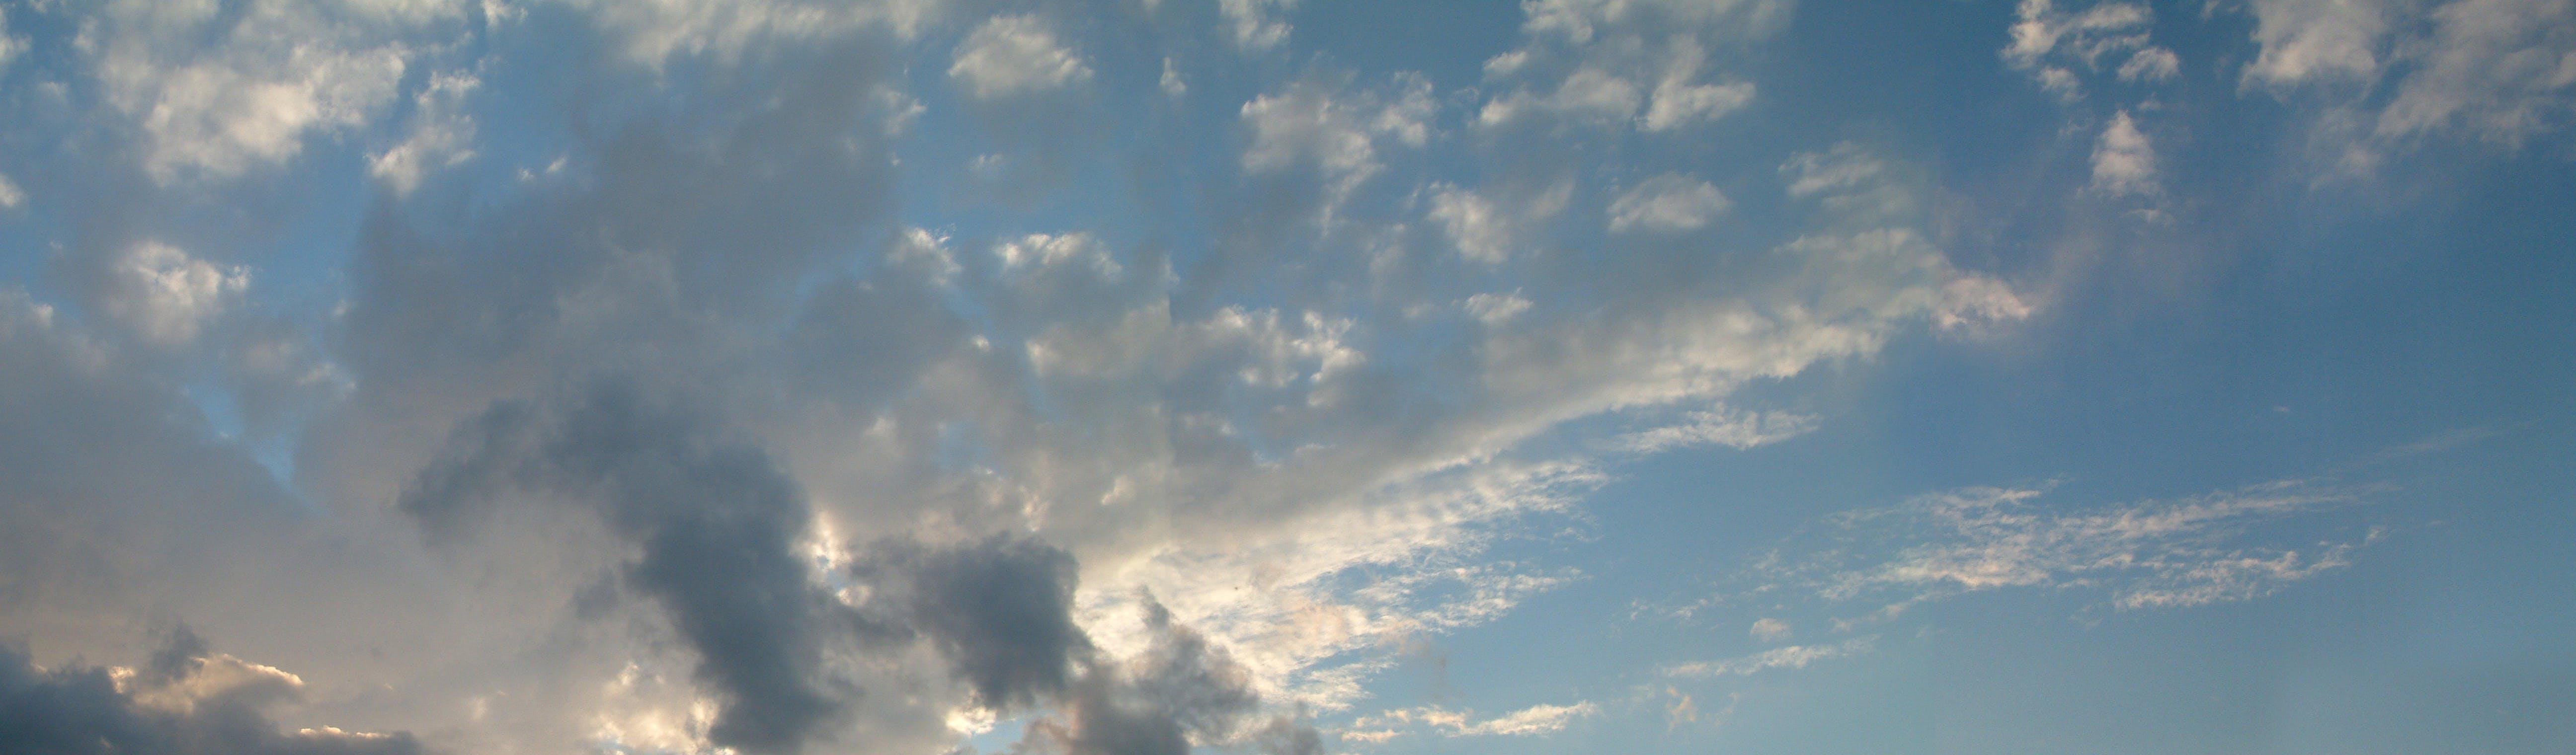 Free stock photo of Costa Rica, sky